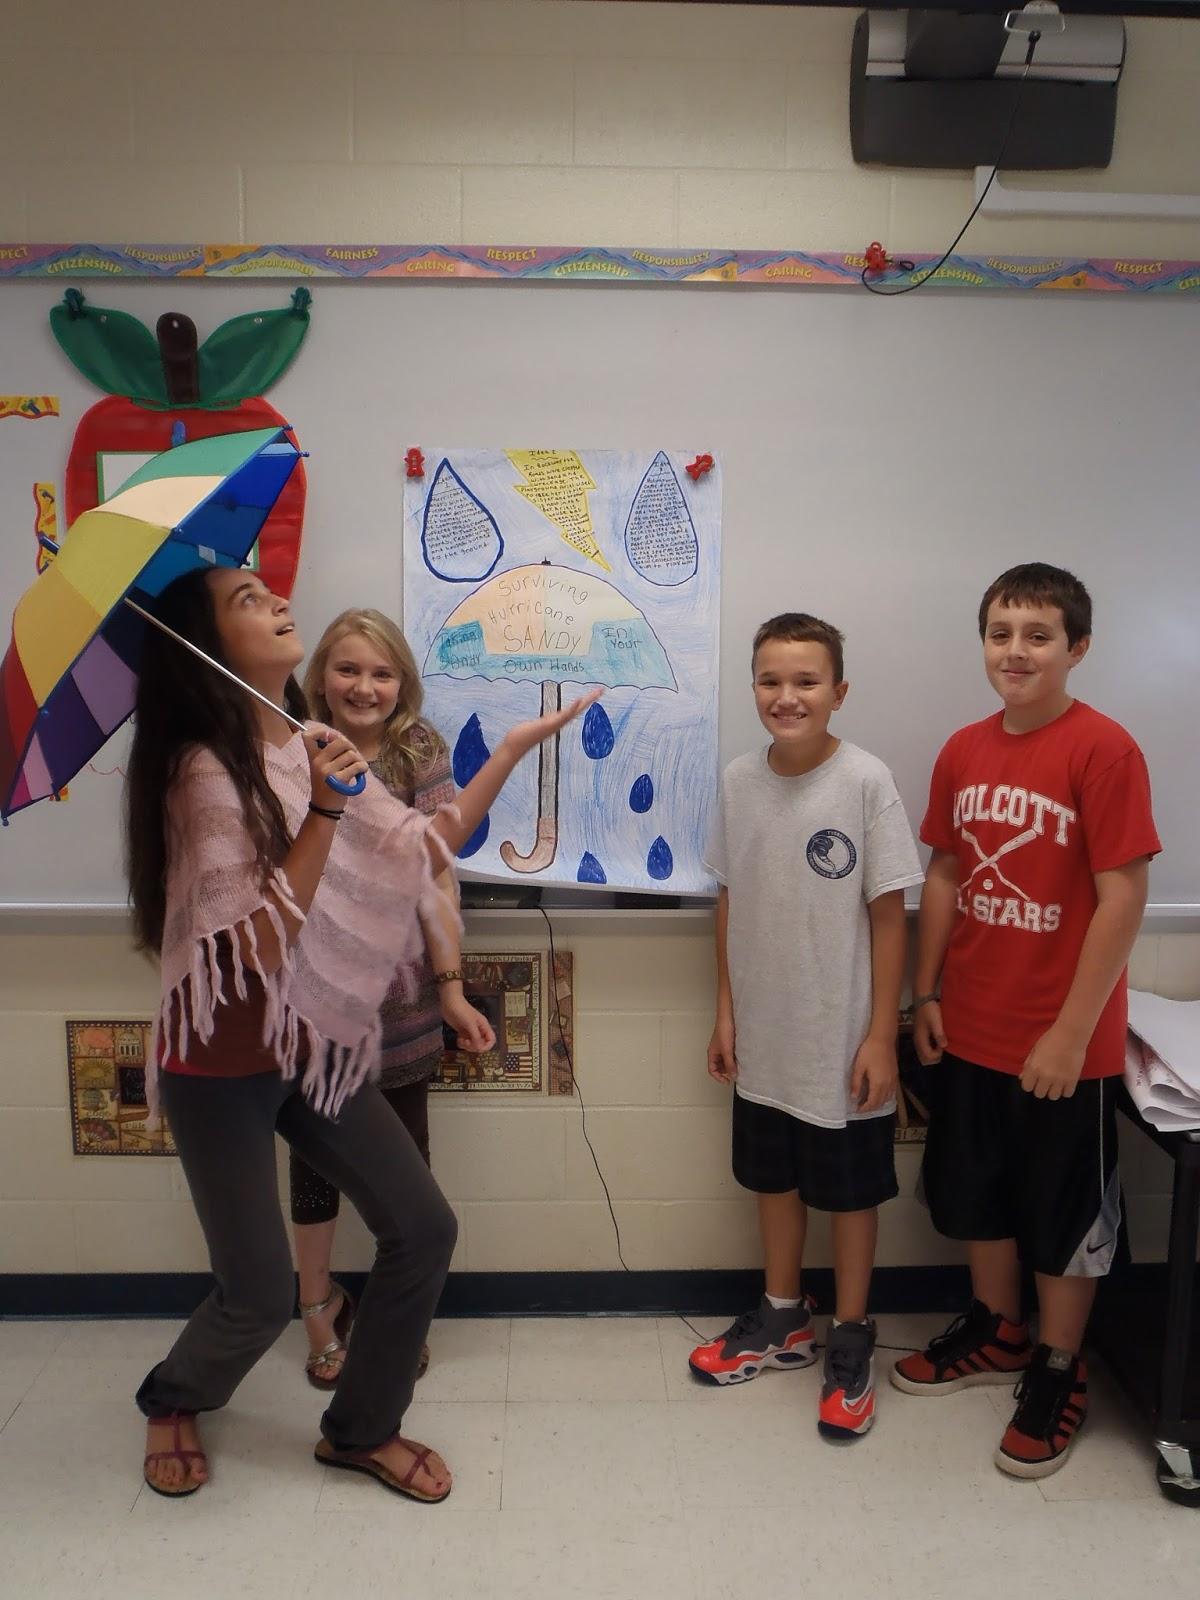 Tyrrell Middle School Under The Main Idea Umbrella